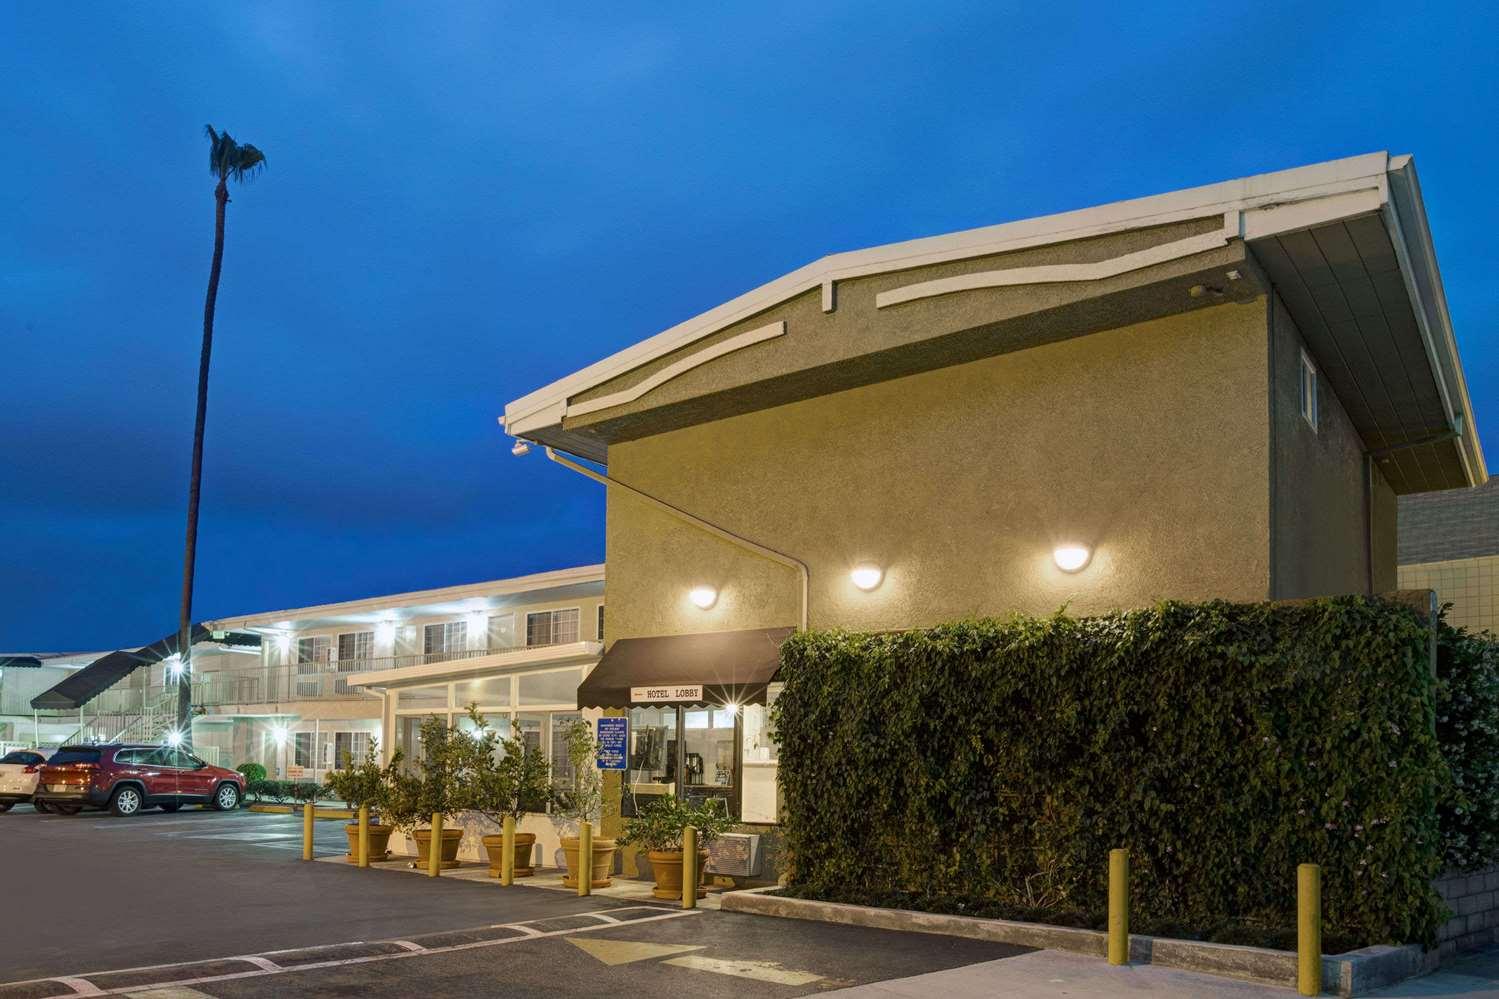 super 8 hotel culver city los angeles ca see discounts. Black Bedroom Furniture Sets. Home Design Ideas